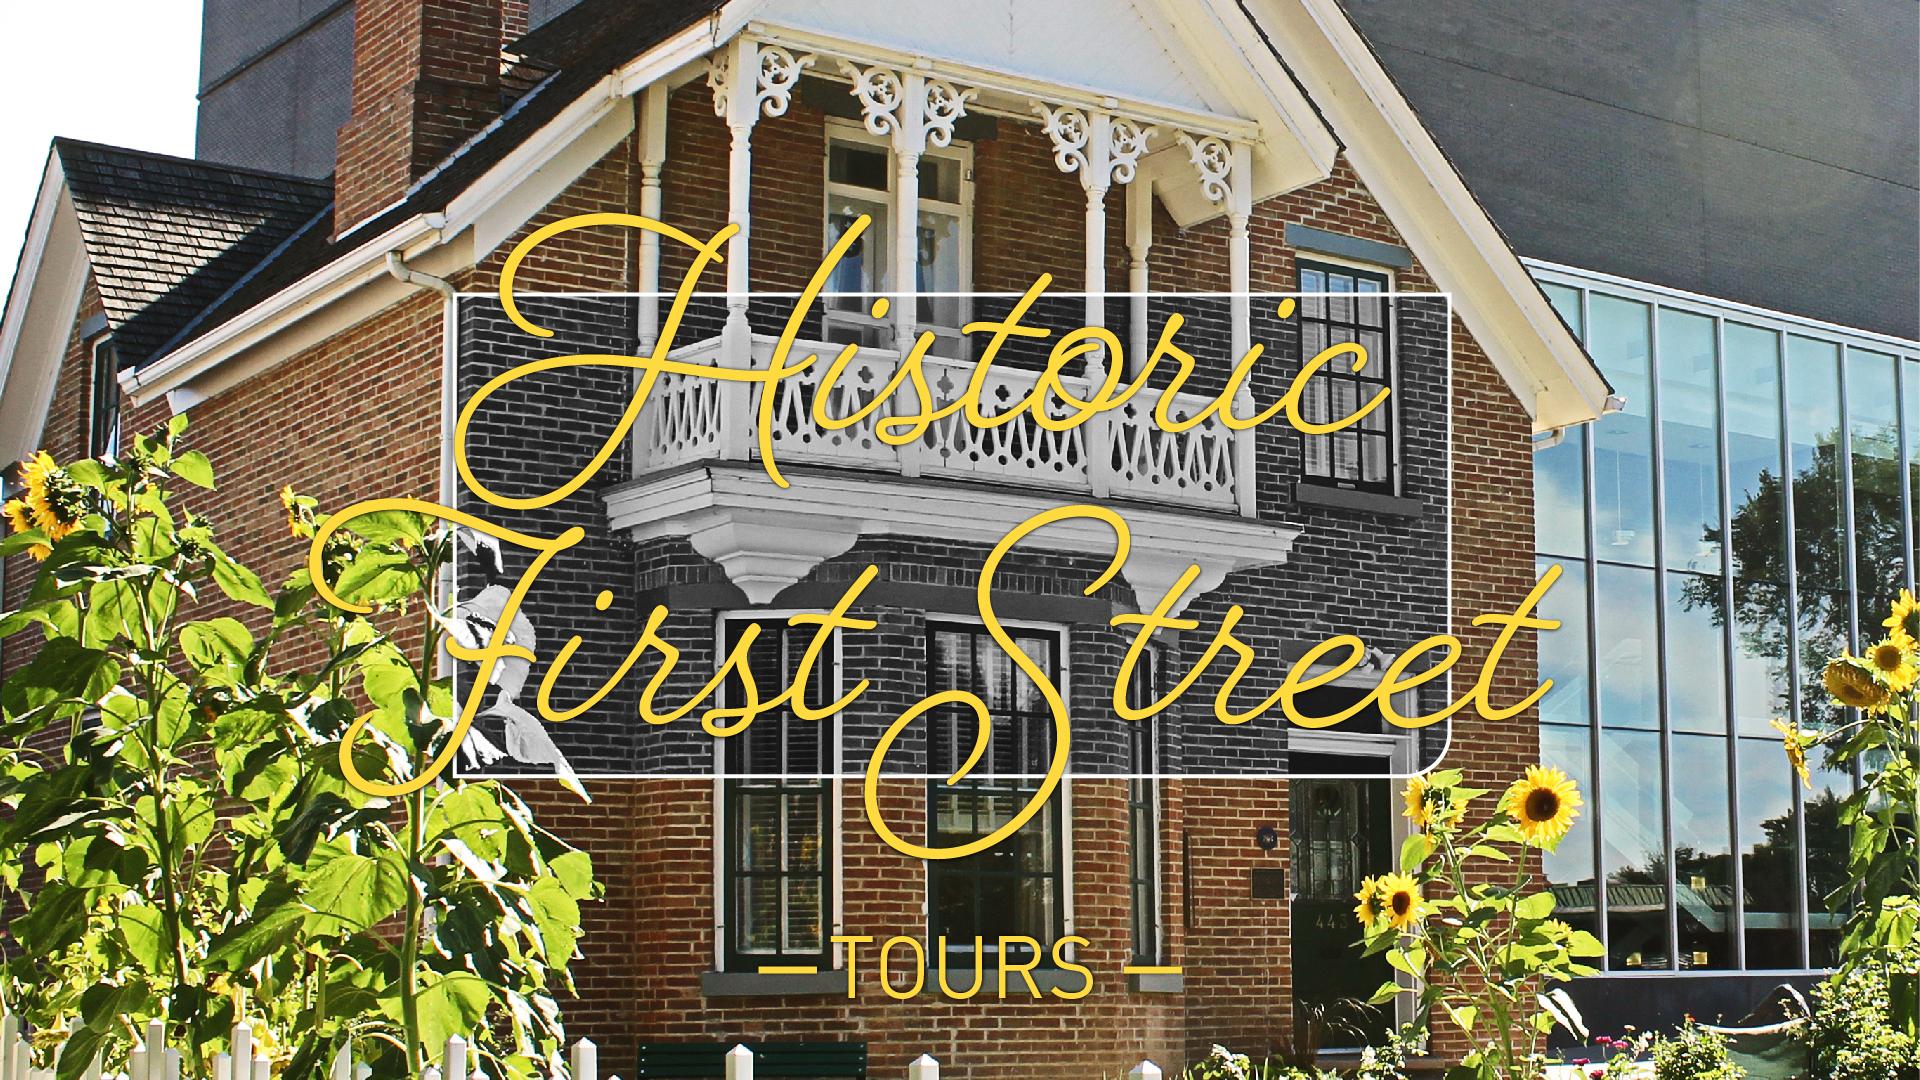 Historic First Street Walking Tours